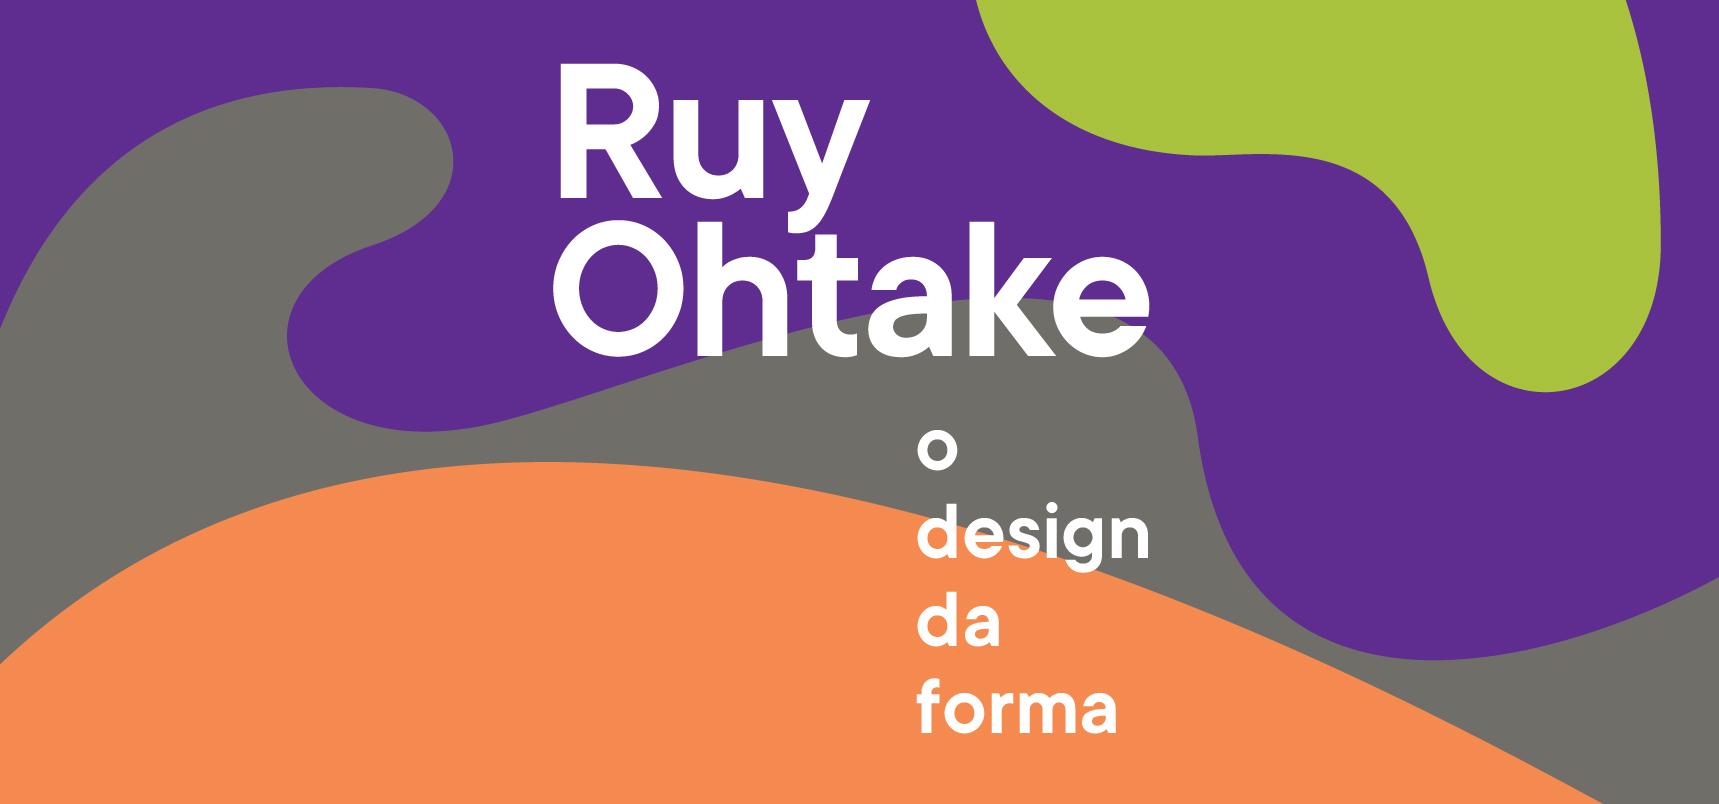 Ruy Ohtake: O design da forma